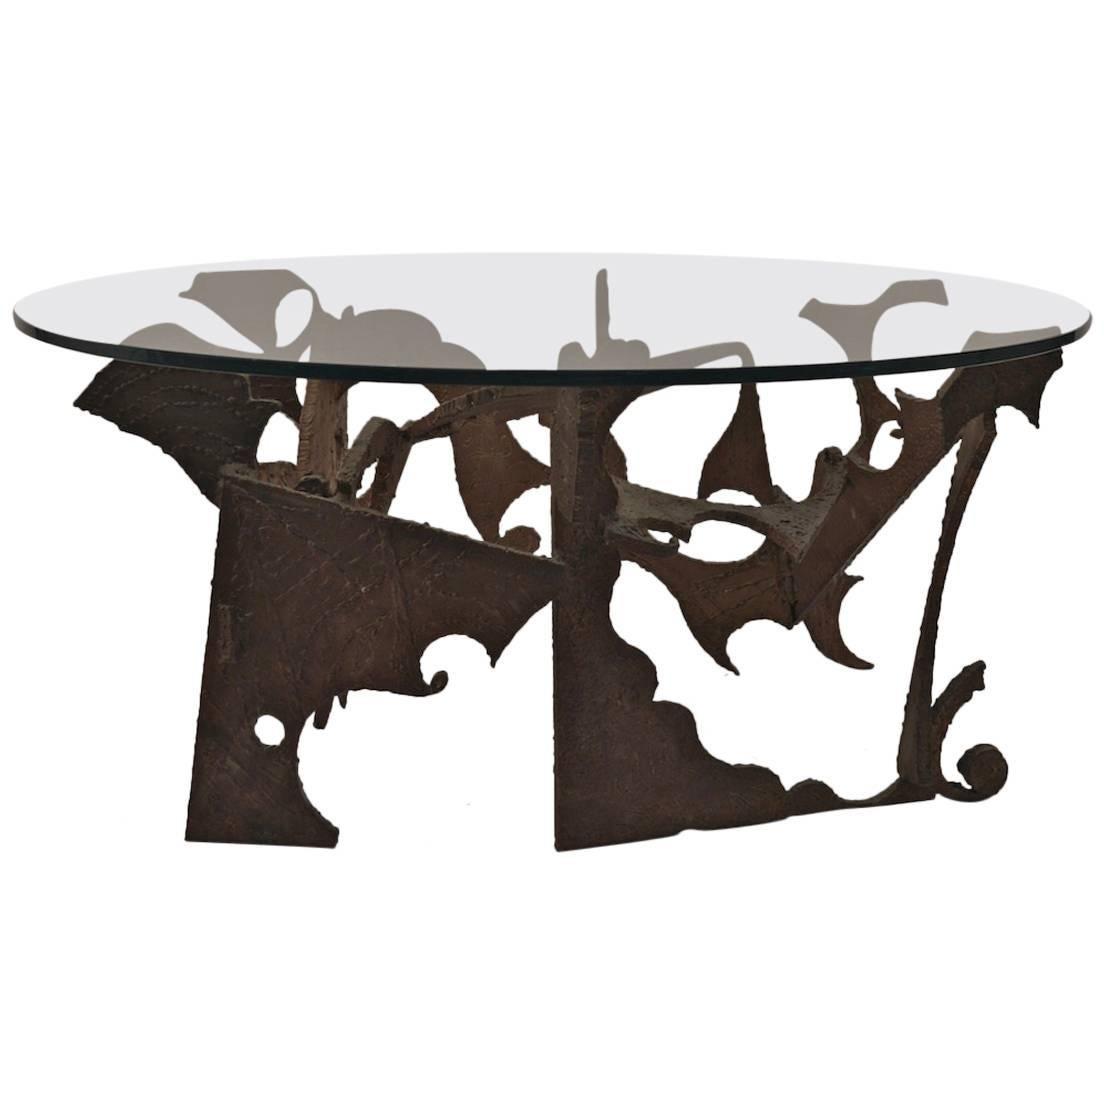 Brutalist Coffee Table by Silas Seandel